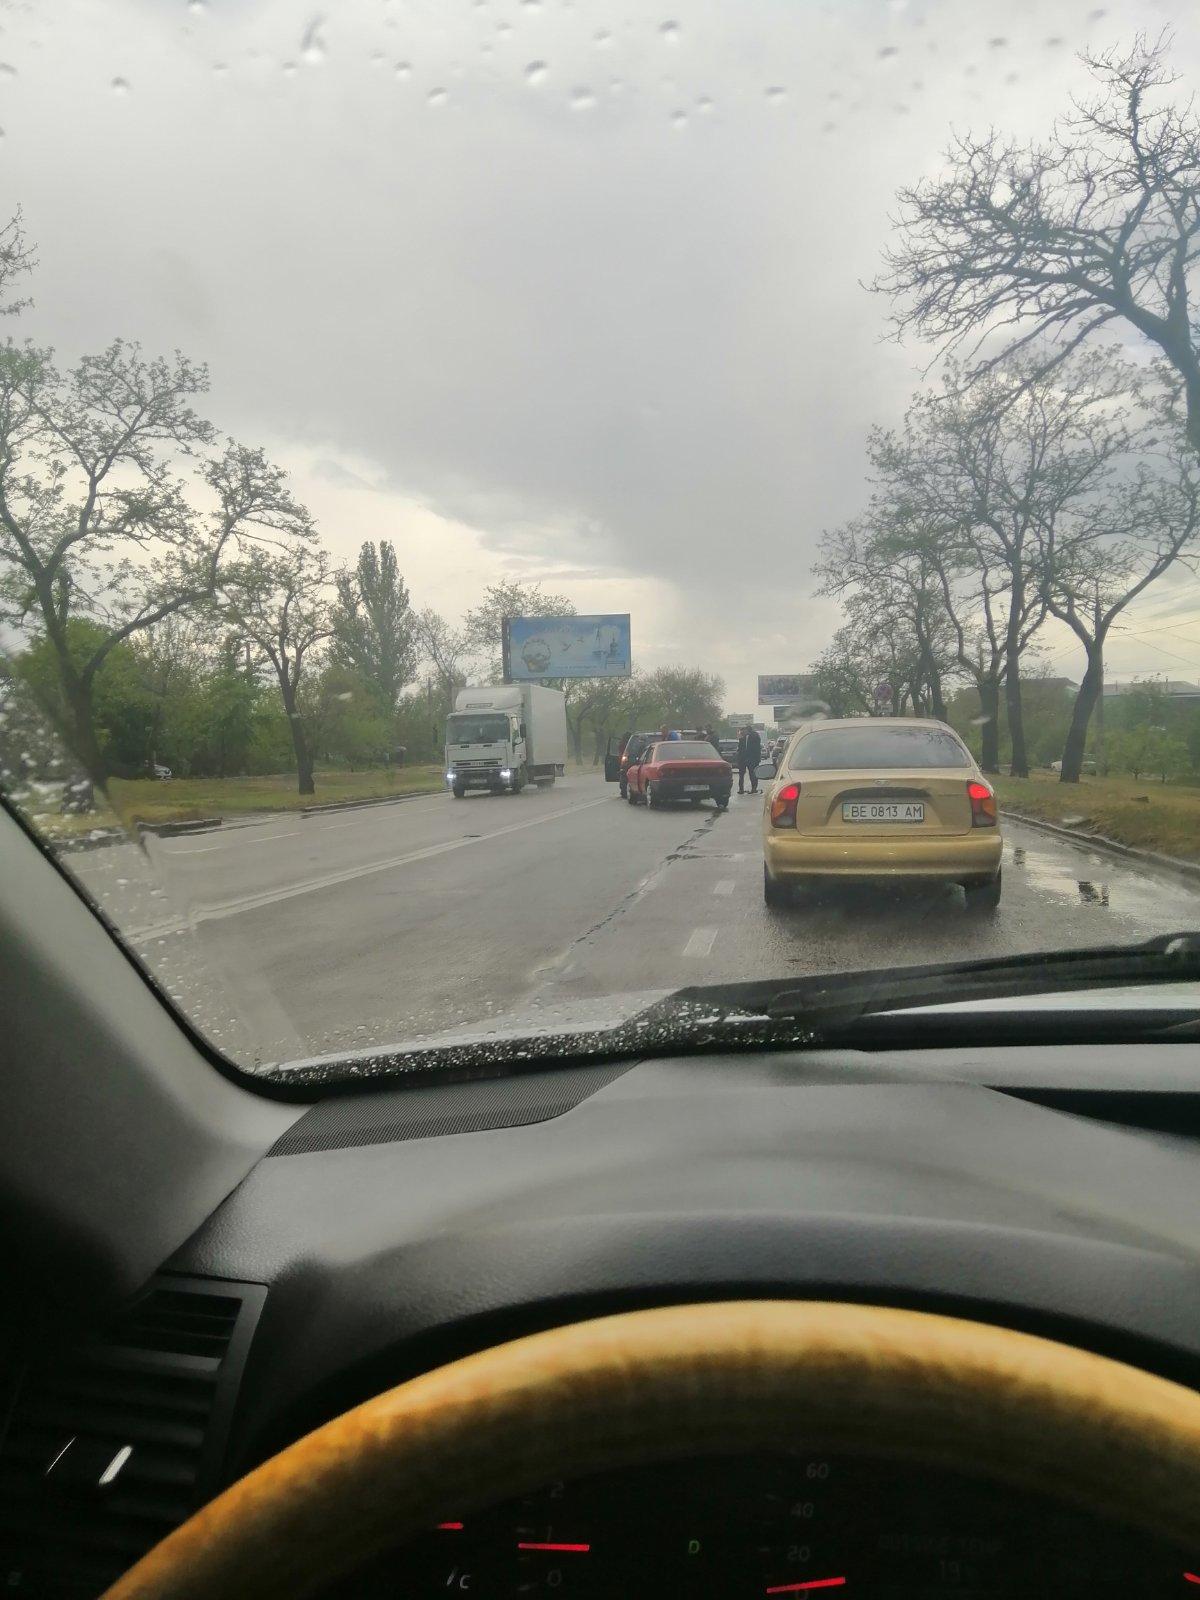 В Николаеве столкнулись иномарки: движение затруднено, фото-1